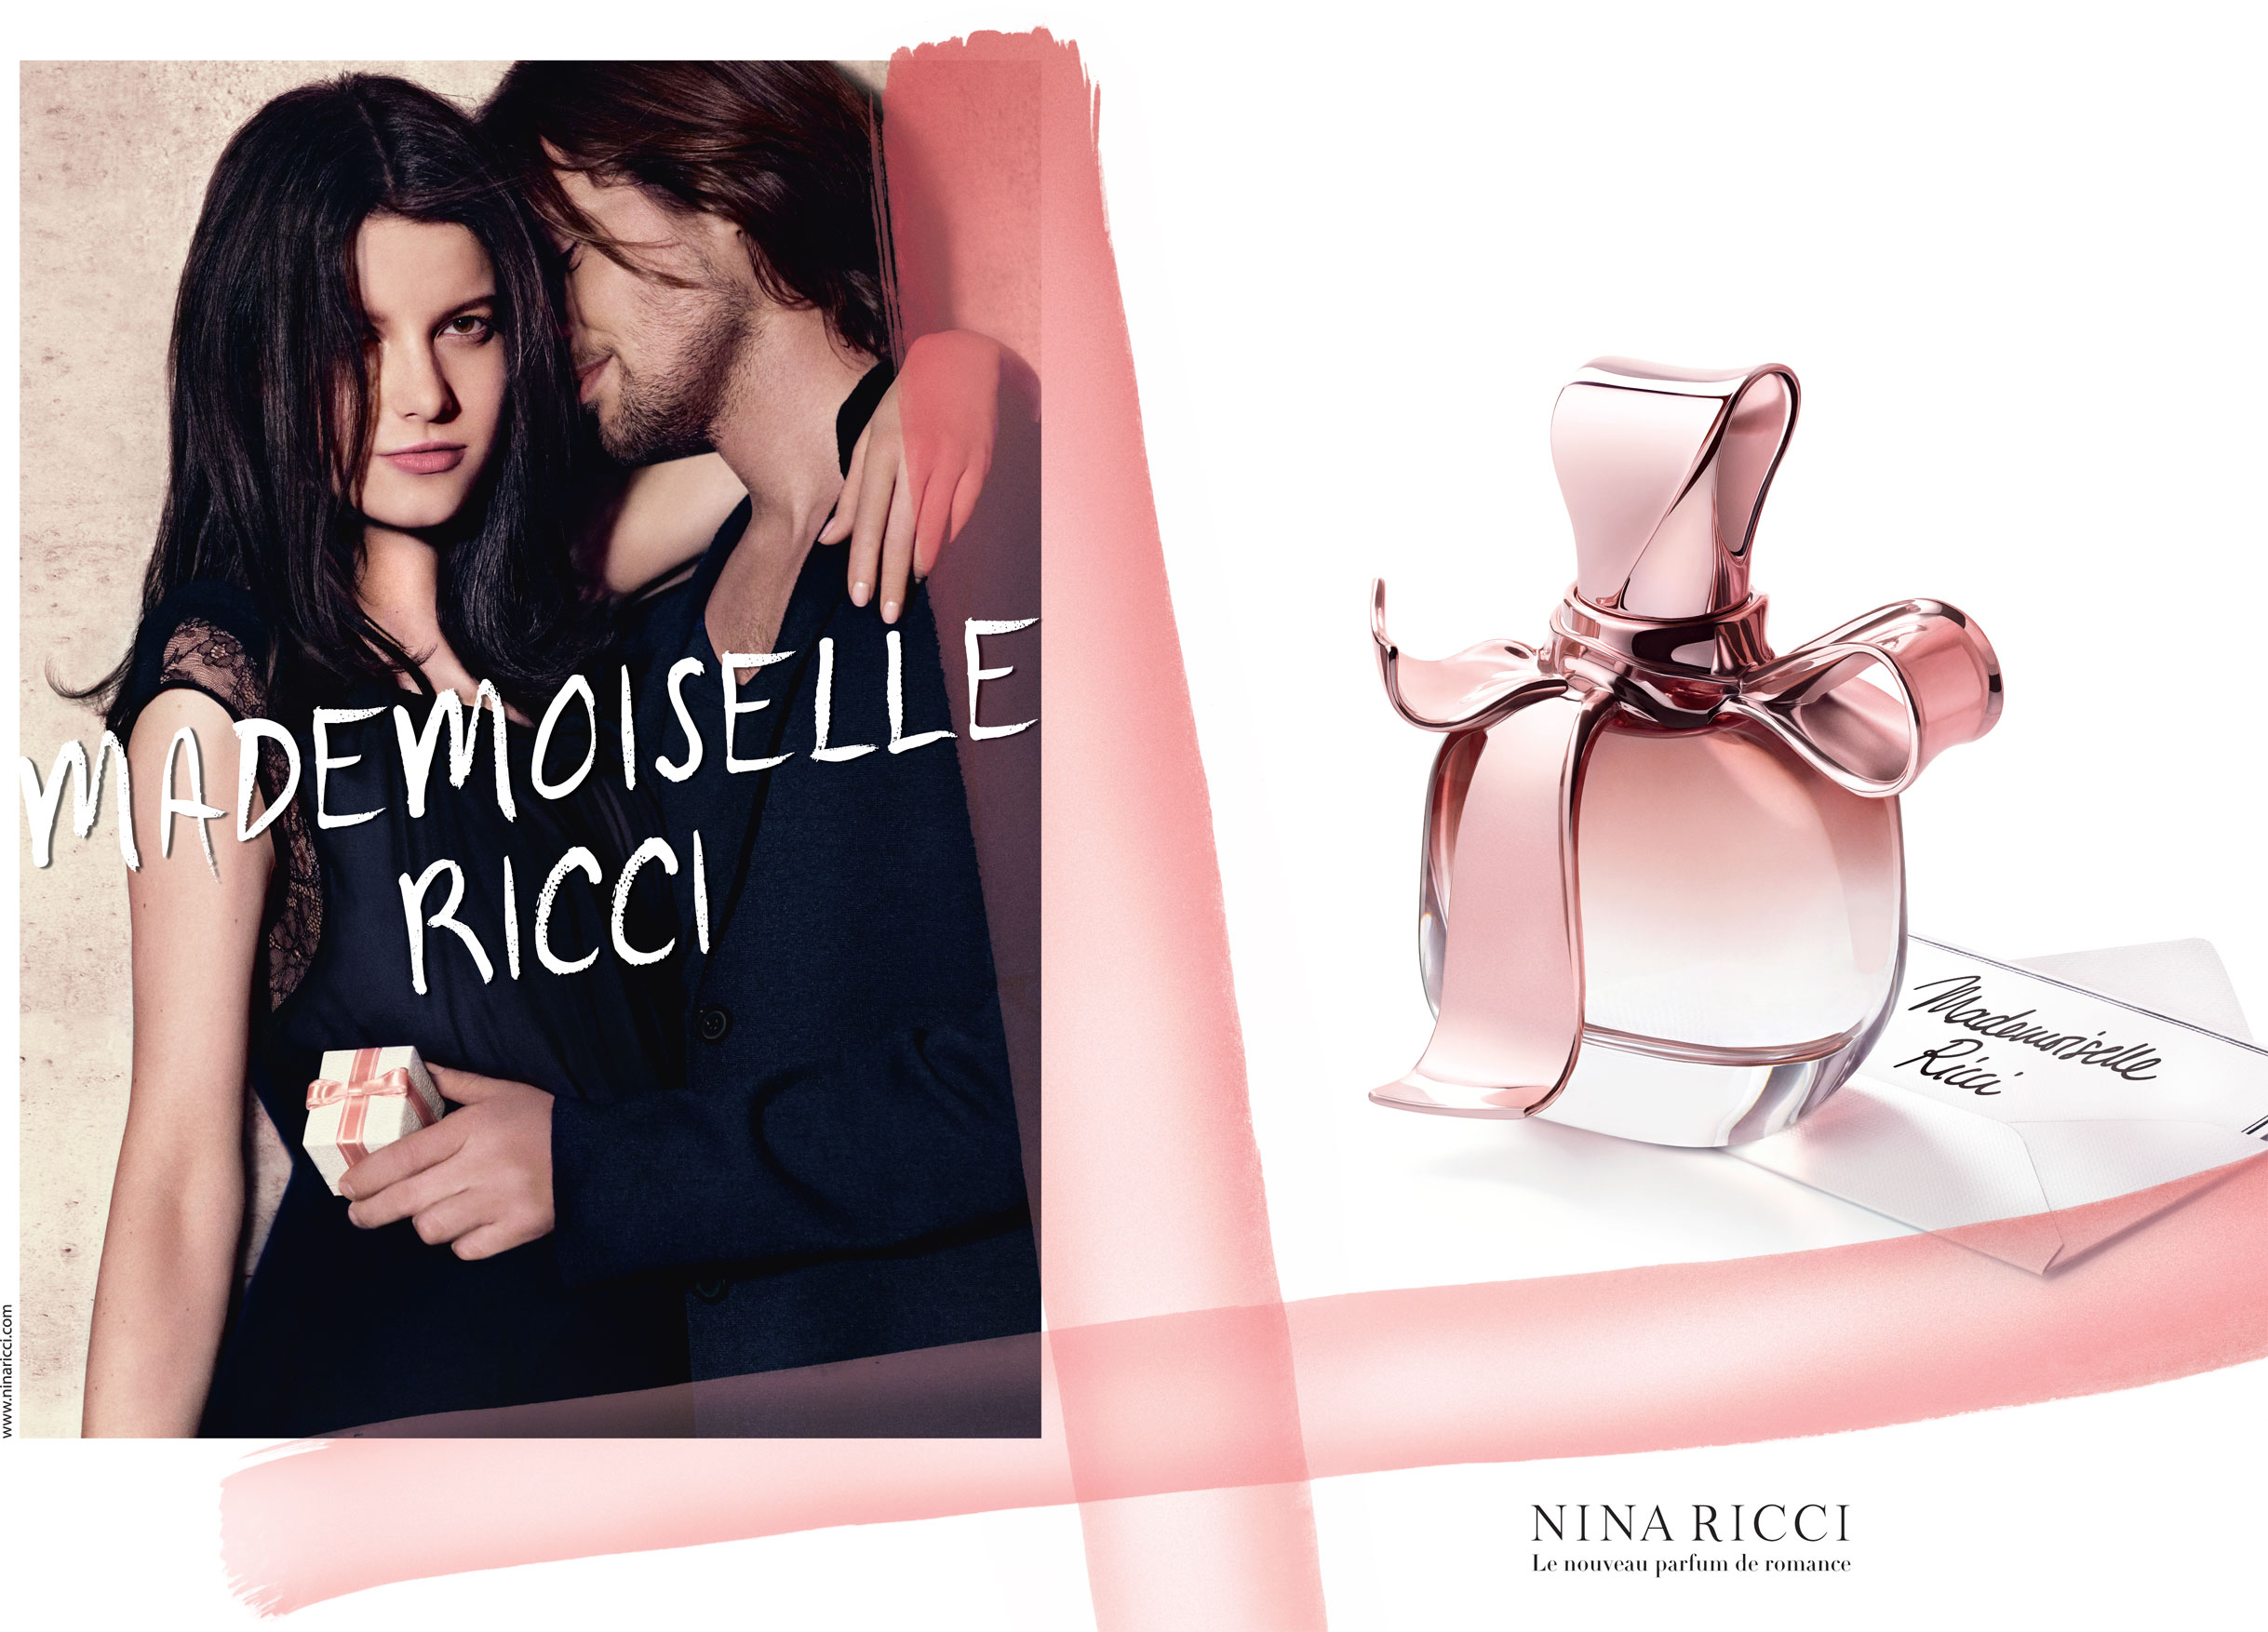 Mademoiselle Ricci. Nina Ricci for Women. Eau de Parfum - Secrets In Beauty